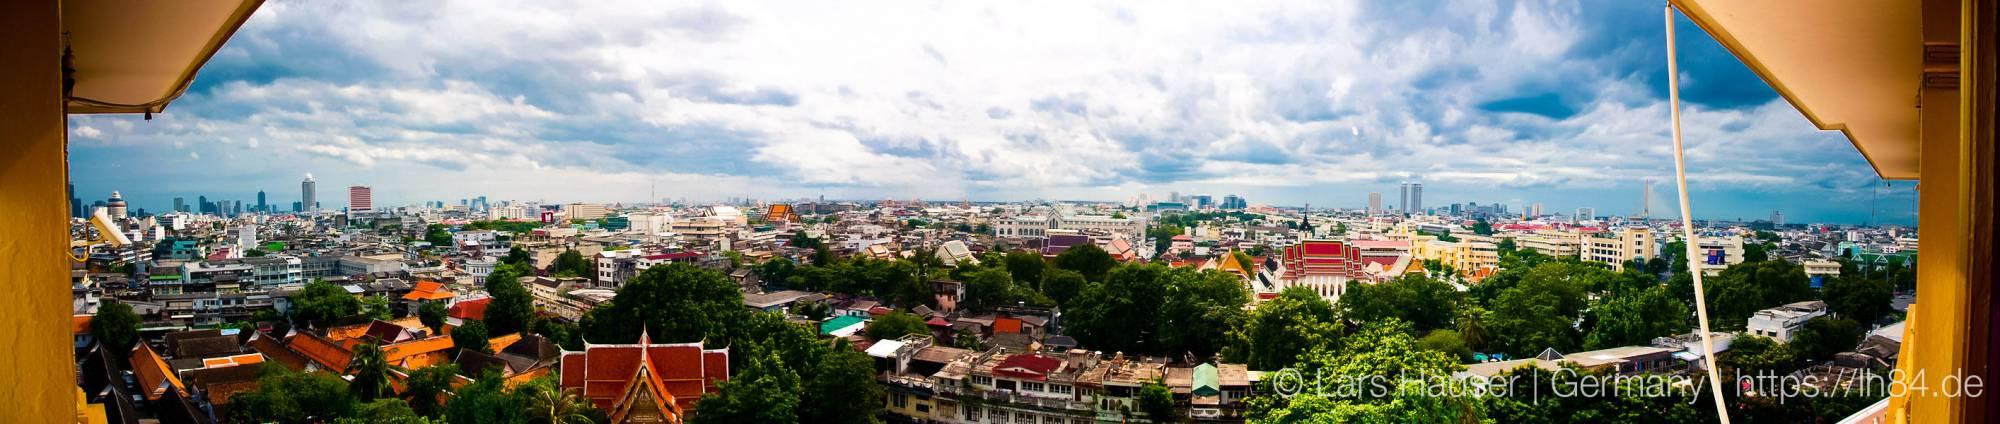 Panorama Bangkok from Golden Mount